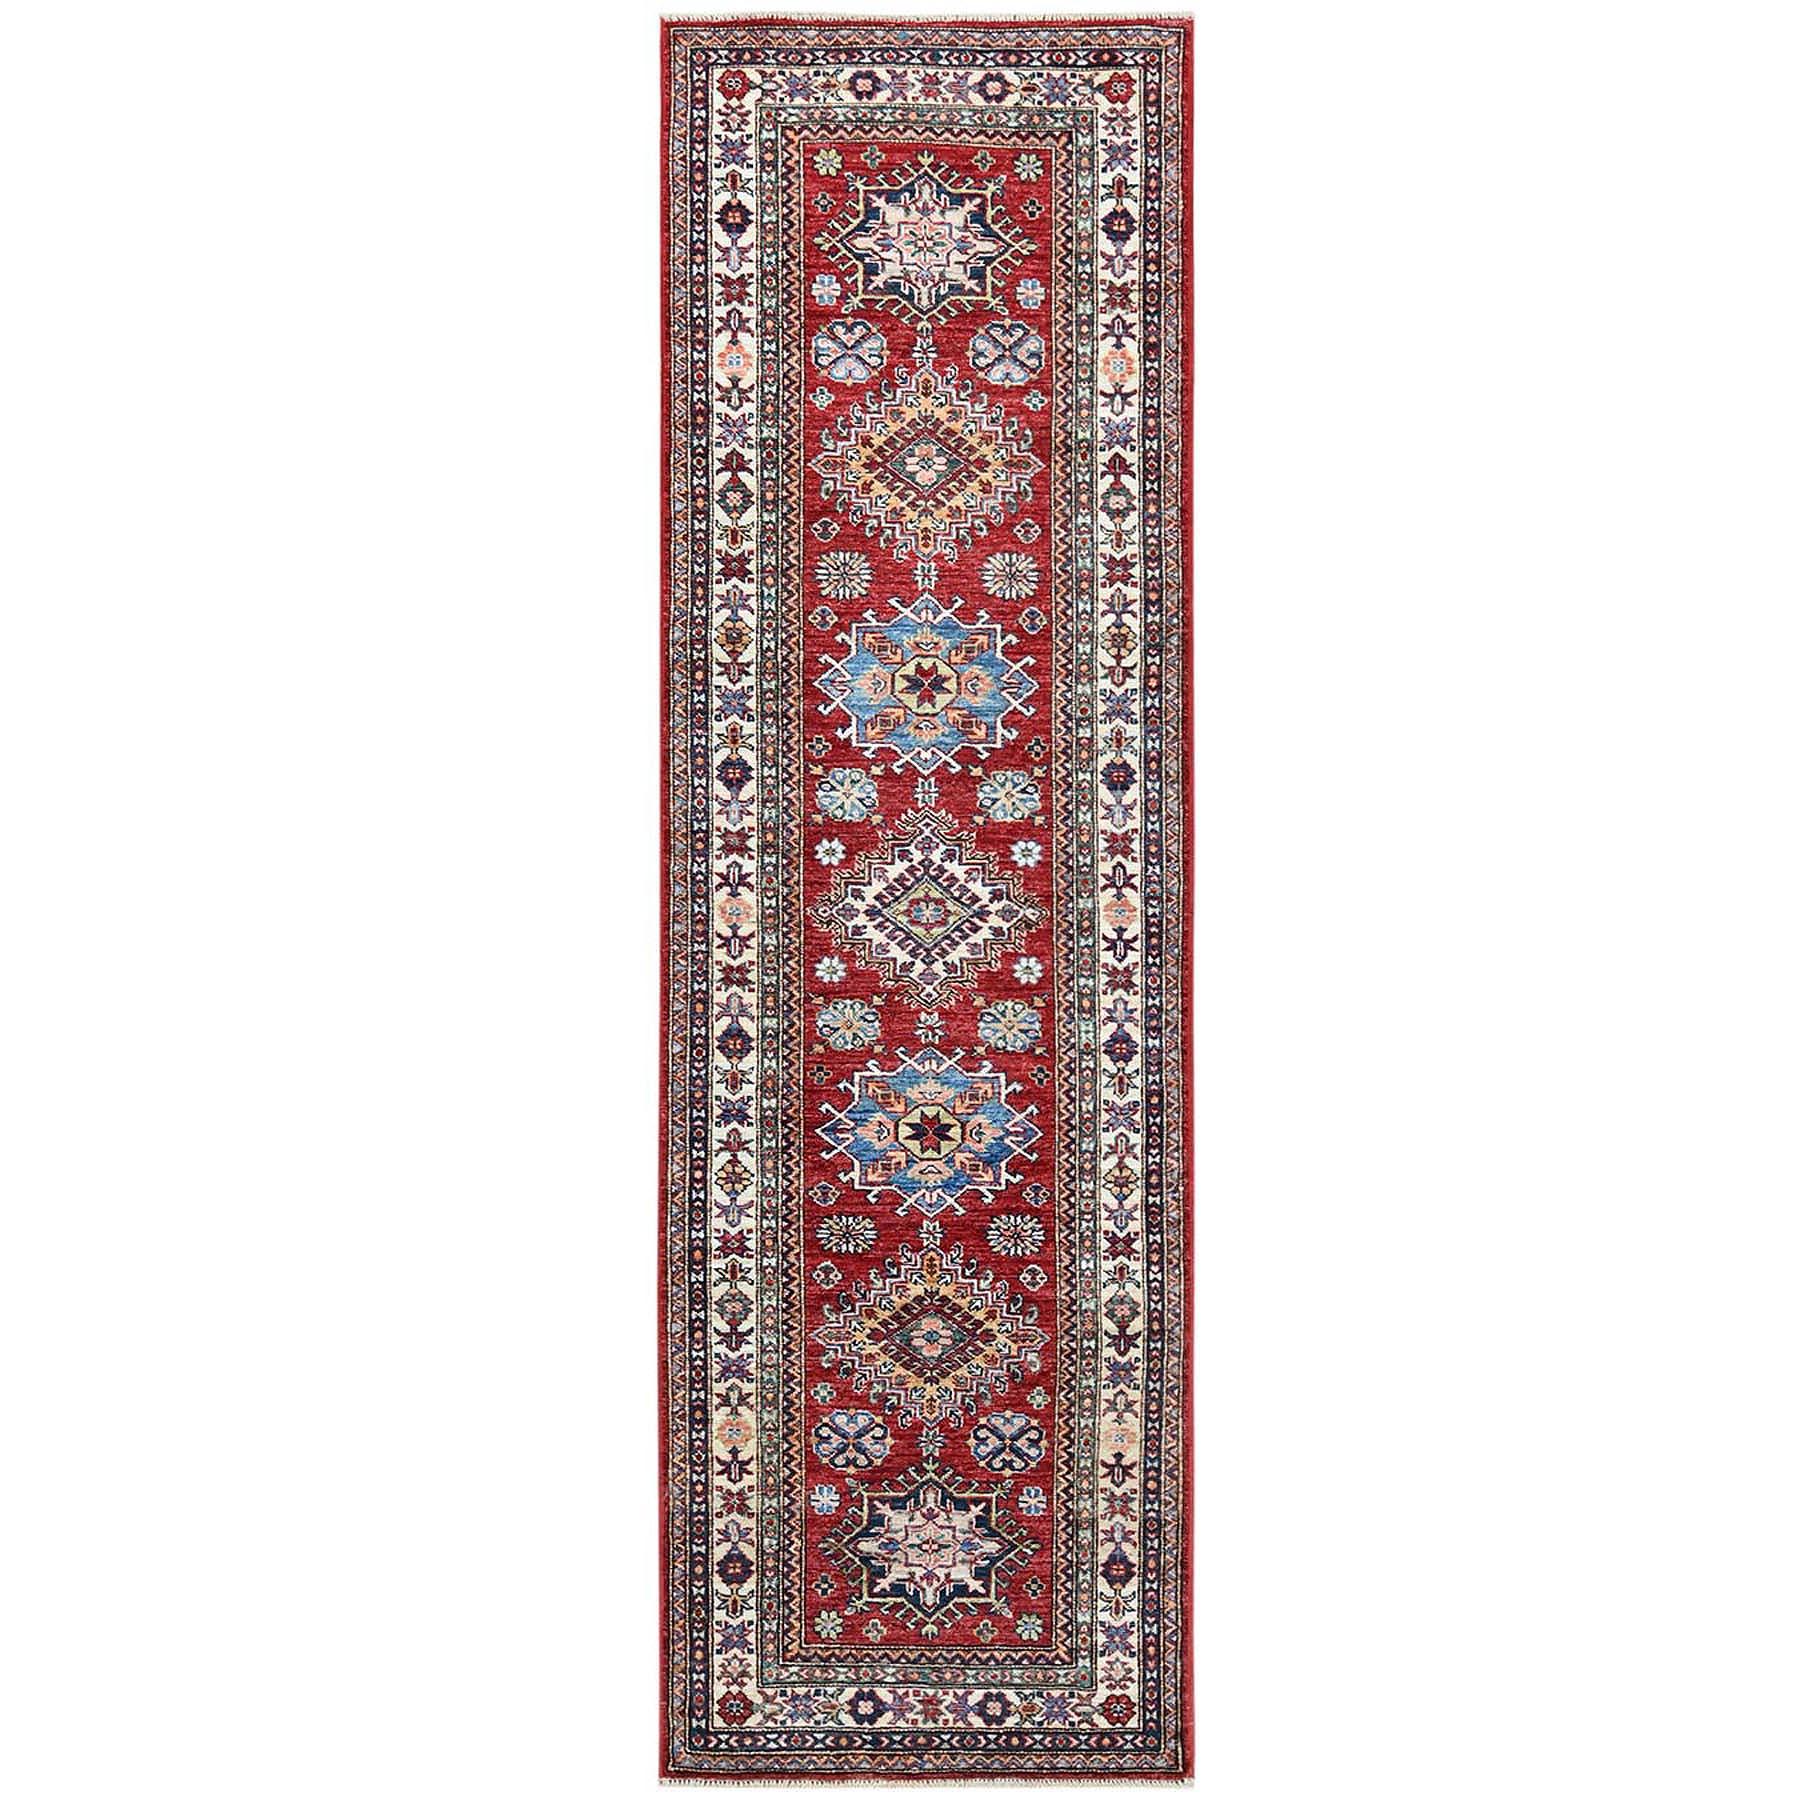 "2'6""x8'5"" Red Super Kazak Primitive Design Hand Knotted Shiny Wool Oriental Runner Rug"